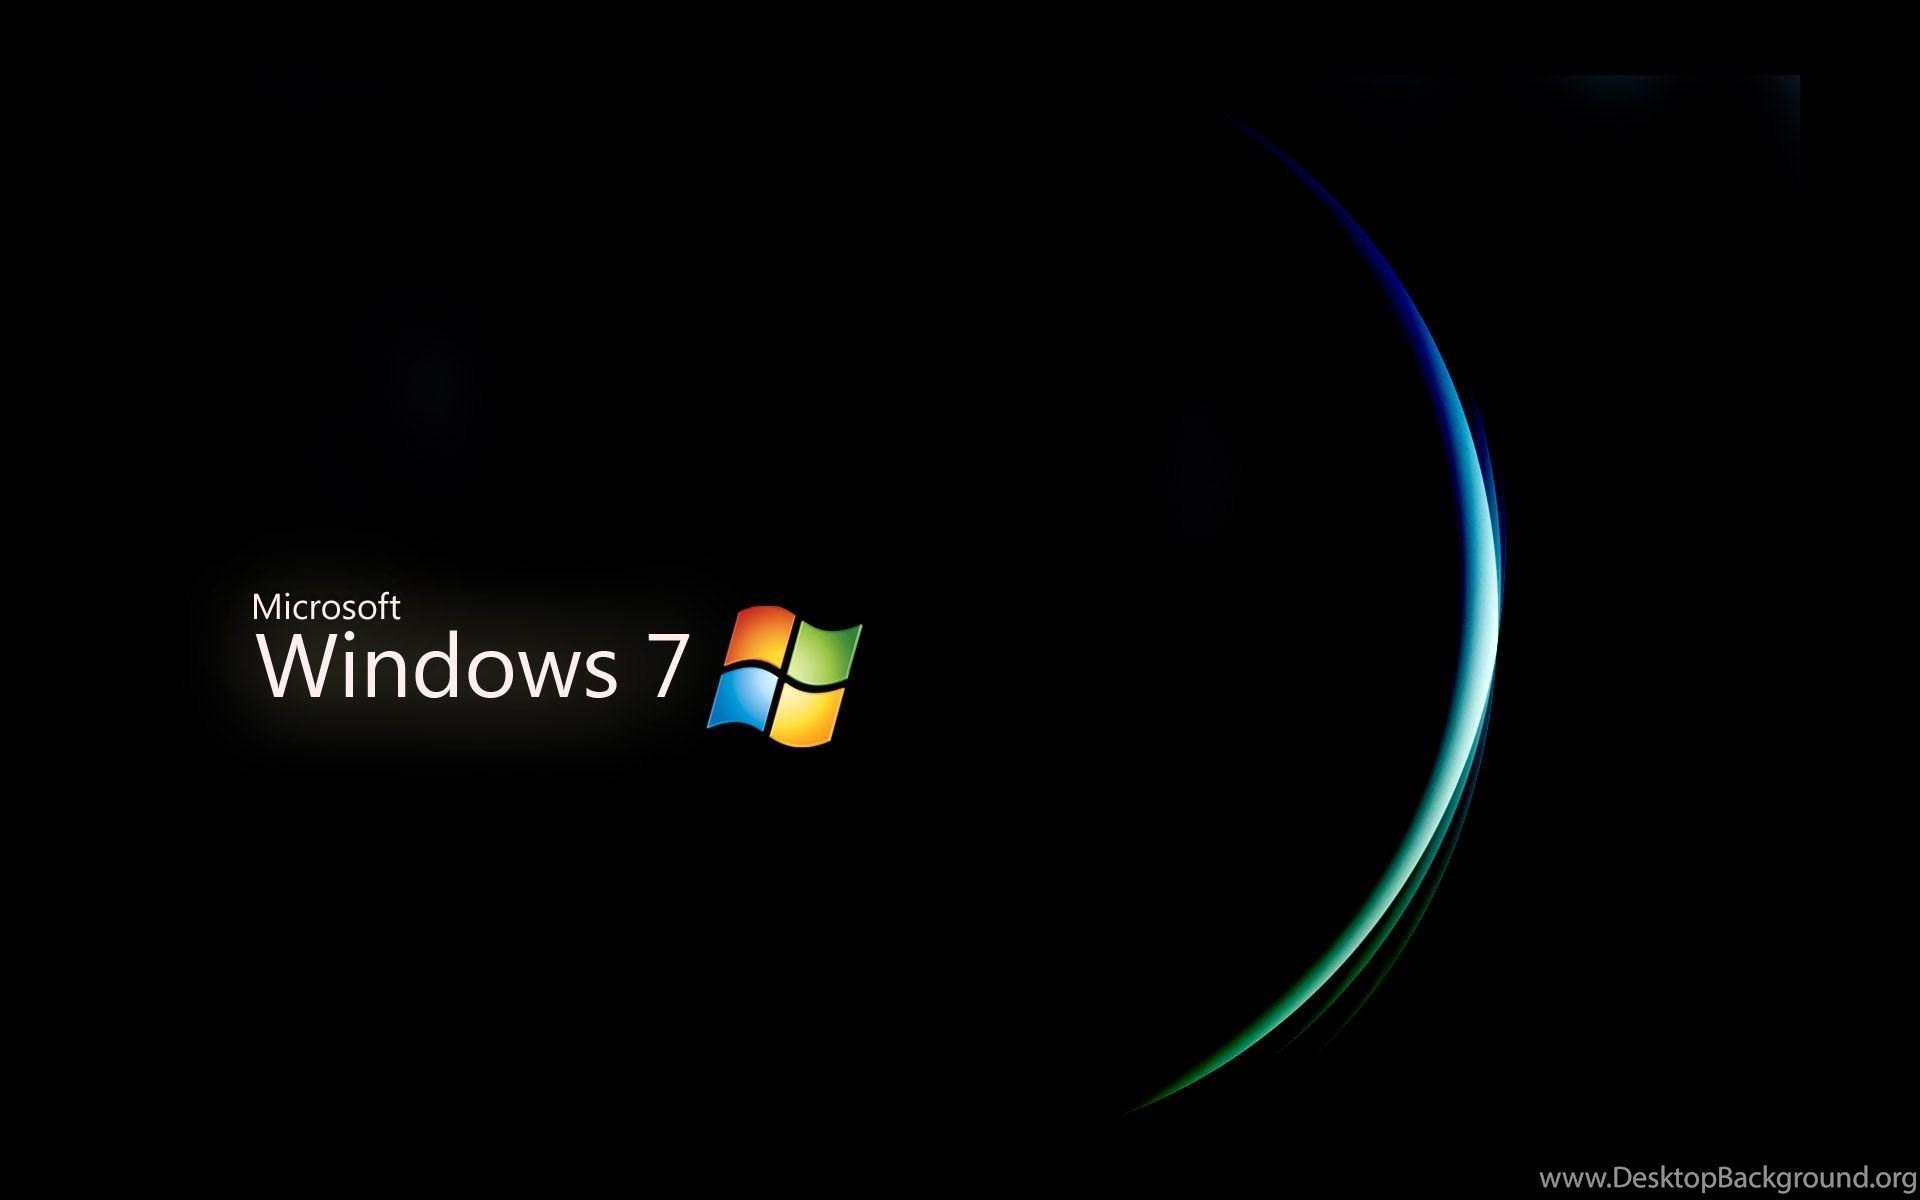 download windows 7 3d hd wallpapers hd wallpapers desktop background